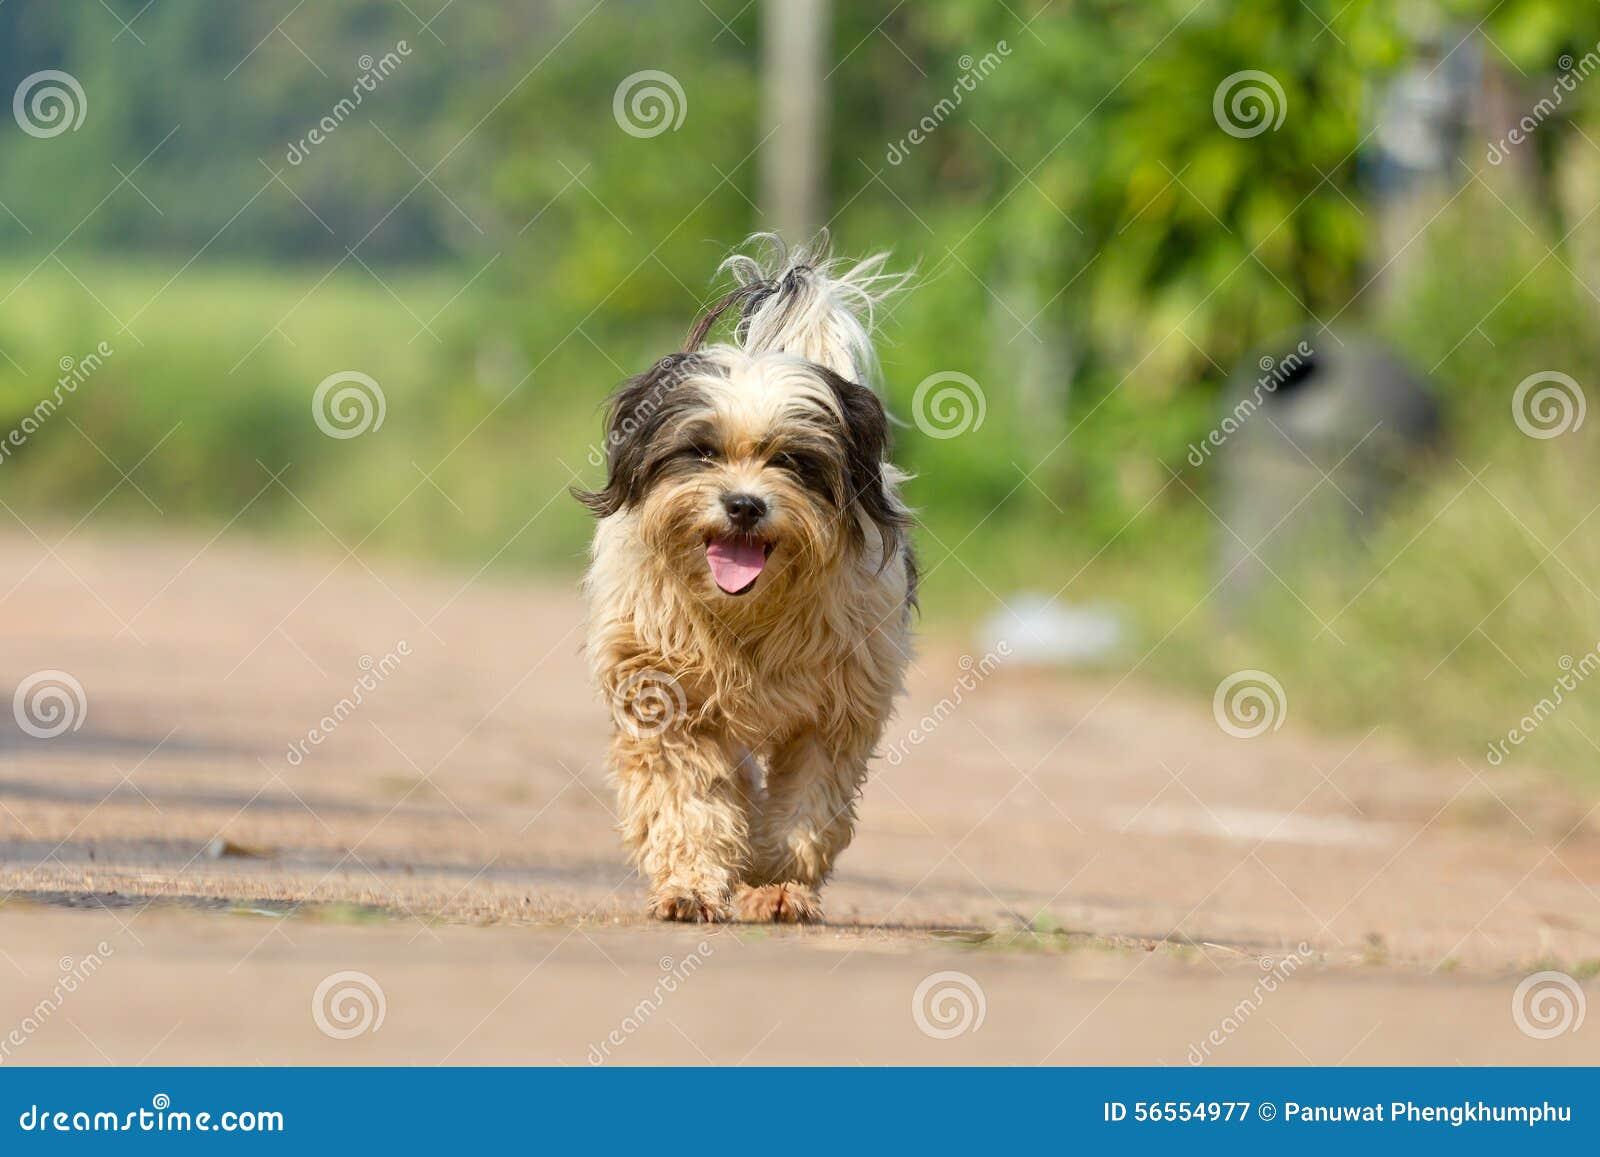 Download Το σκυλί που τρέχει ή που περπατά στο δρόμο Στοκ Εικόνα - εικόνα από πράσινος, χρυσός: 56554977